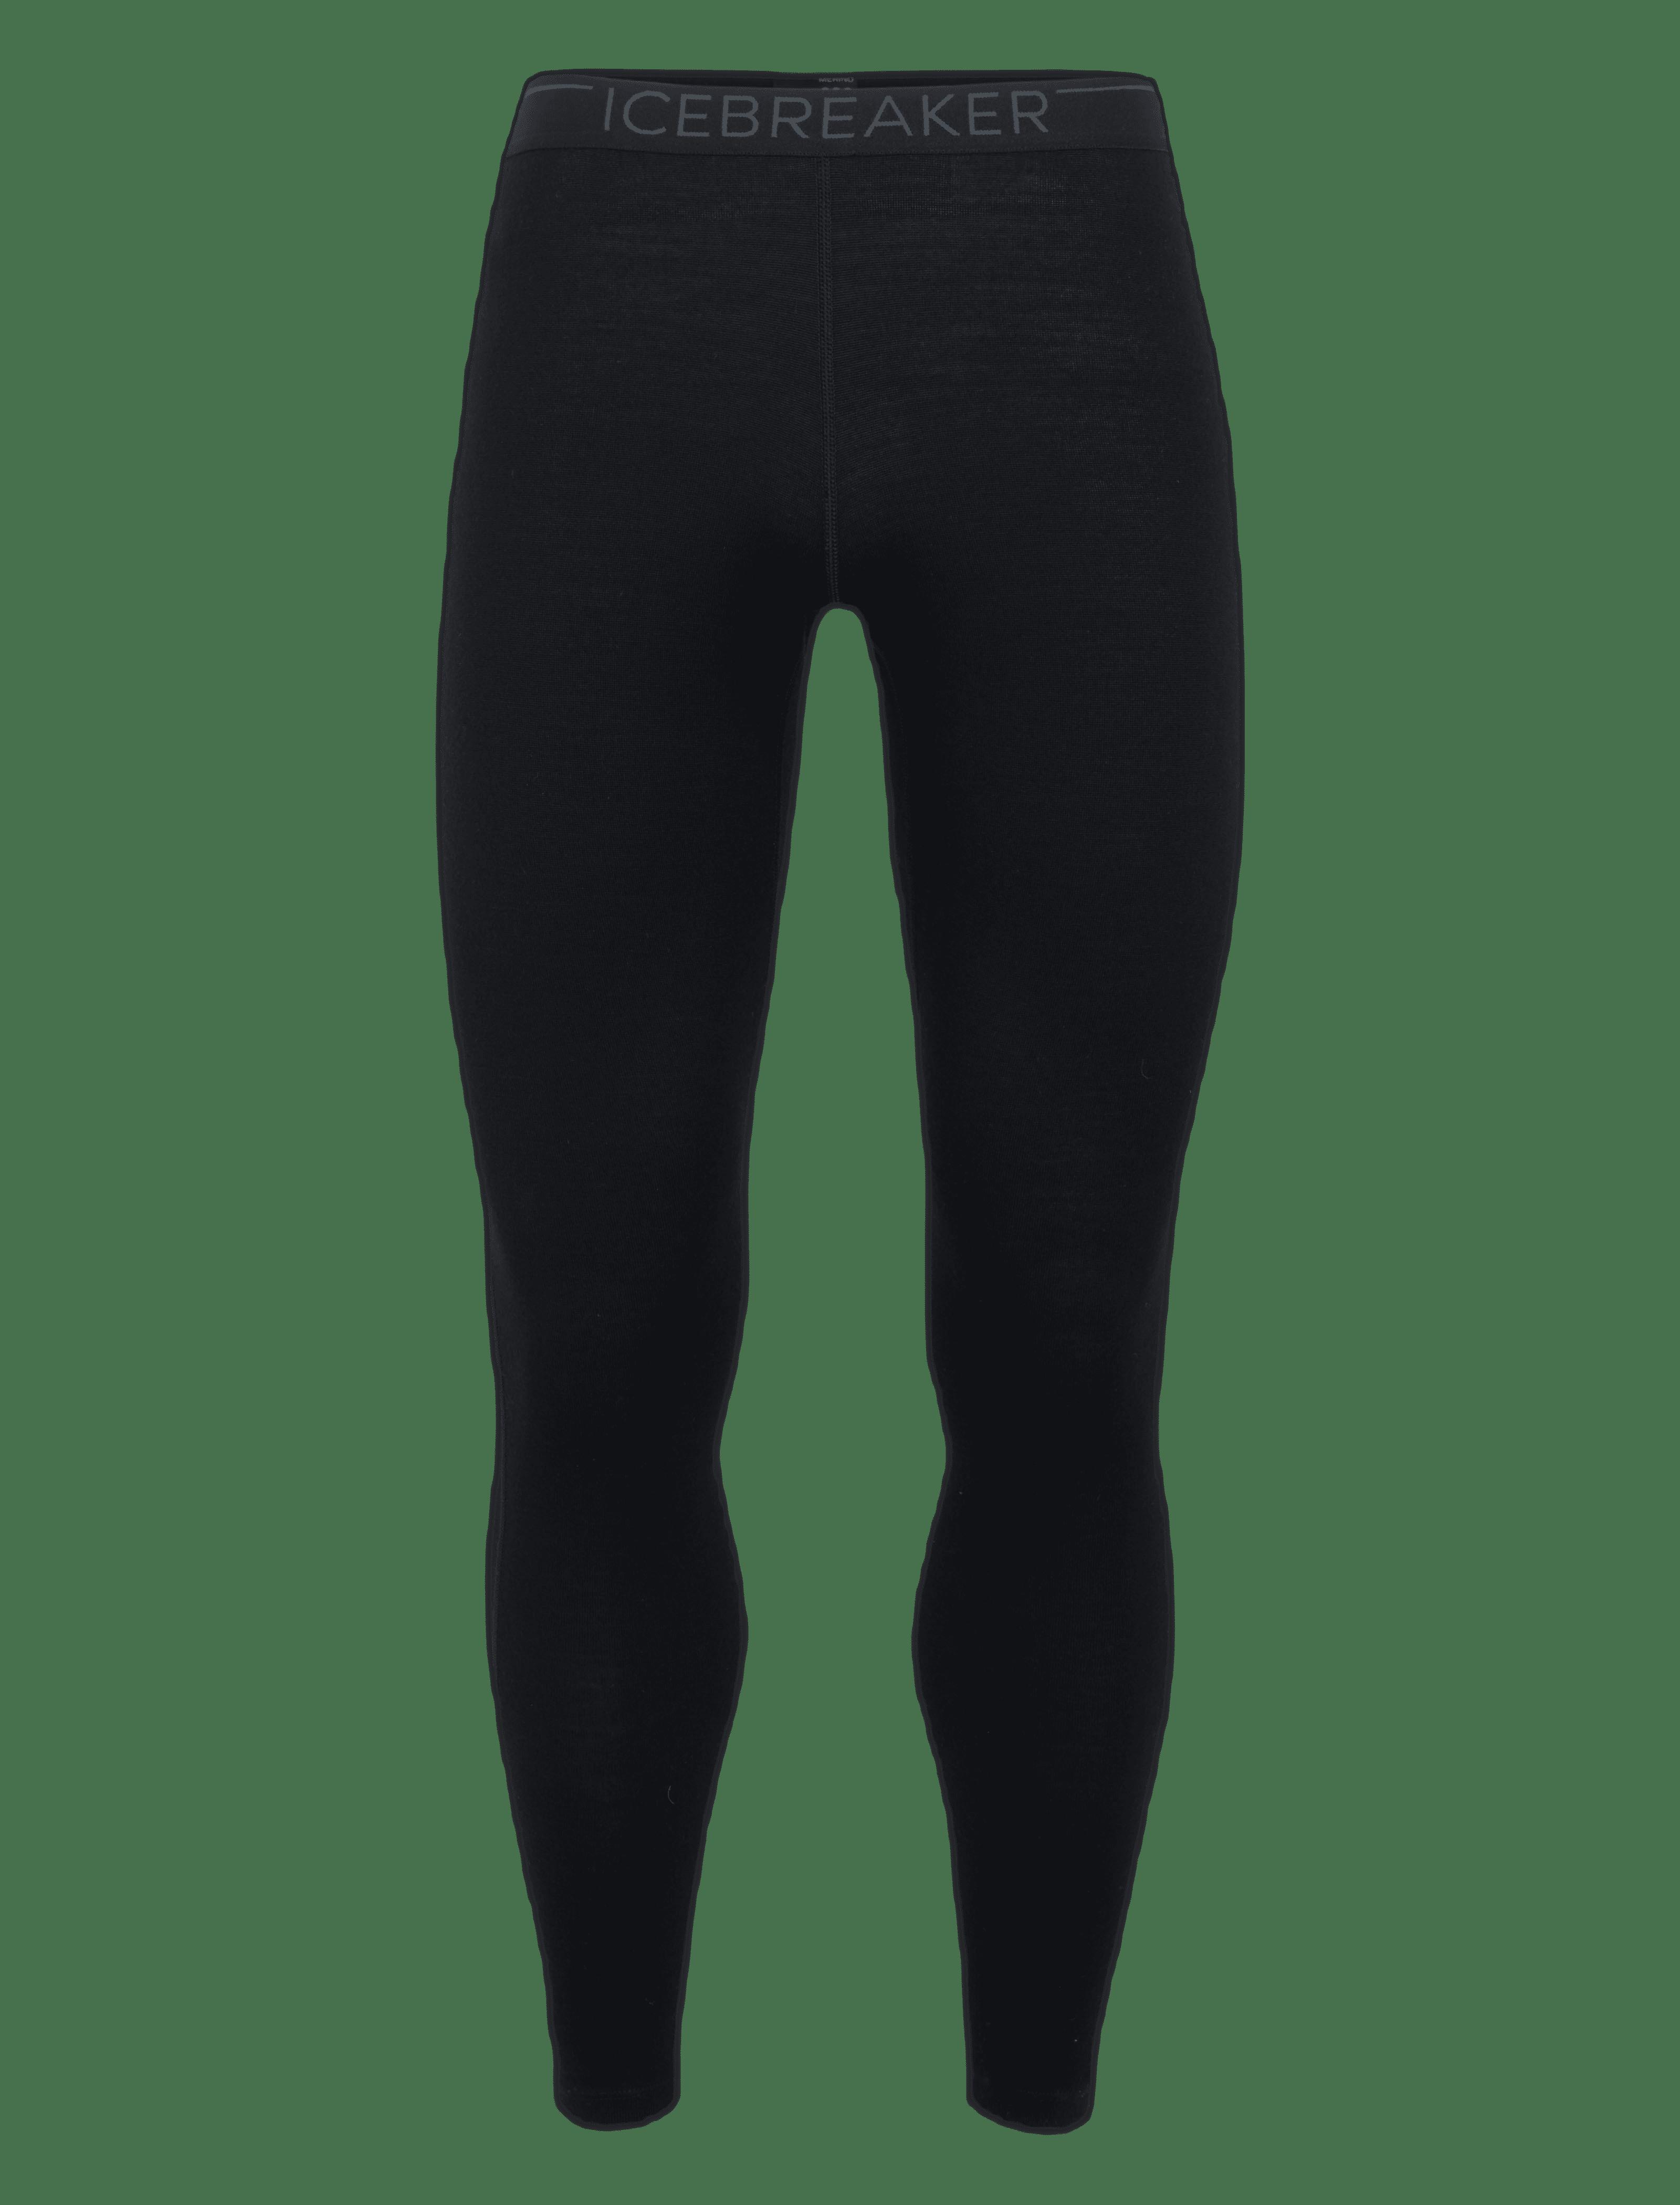 260 tech leggings